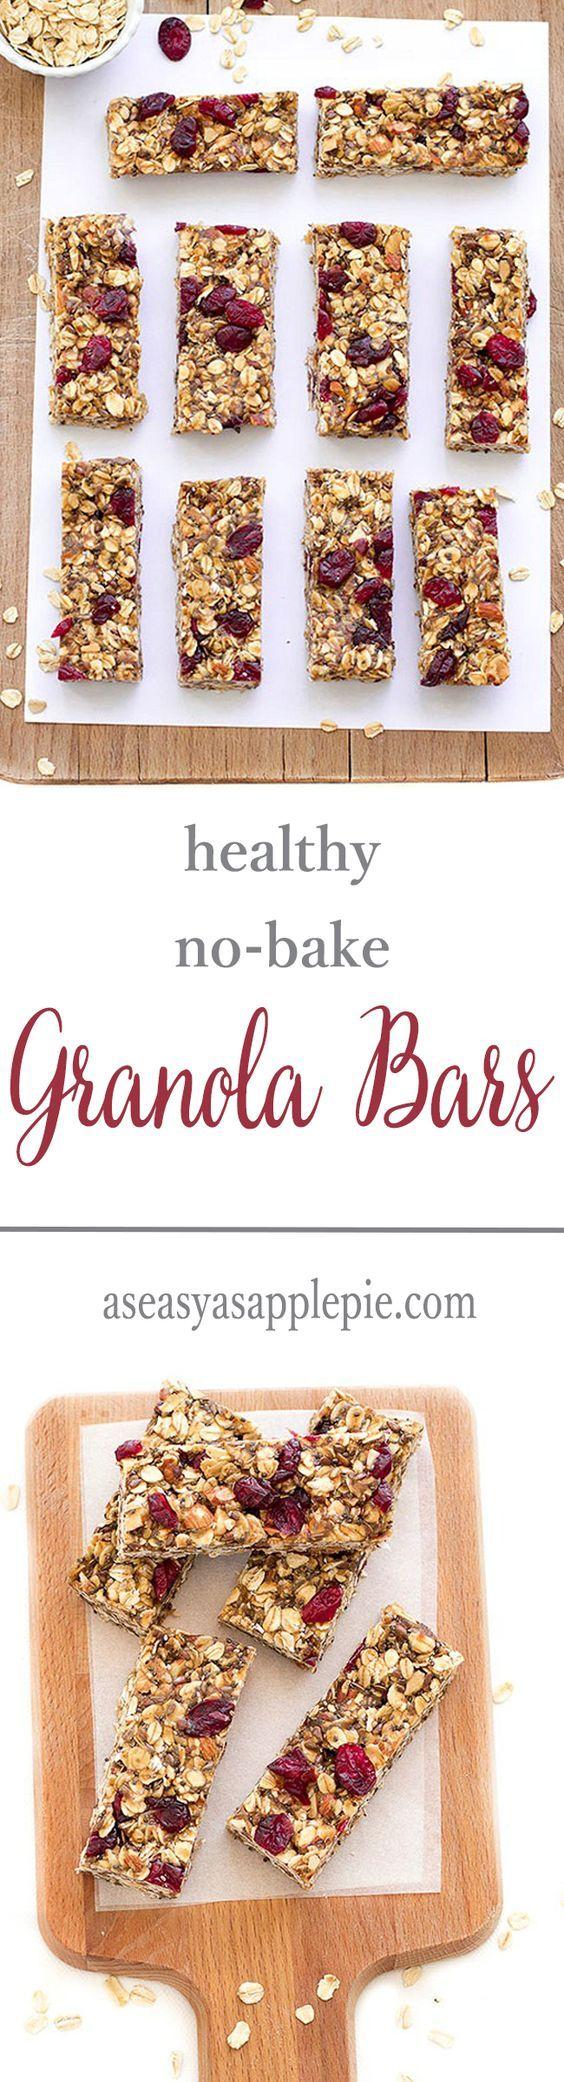 These healthy no-bake granola bars are vegan, gluten-free and refined sugar-free.                                                                                                                                                                                 Más